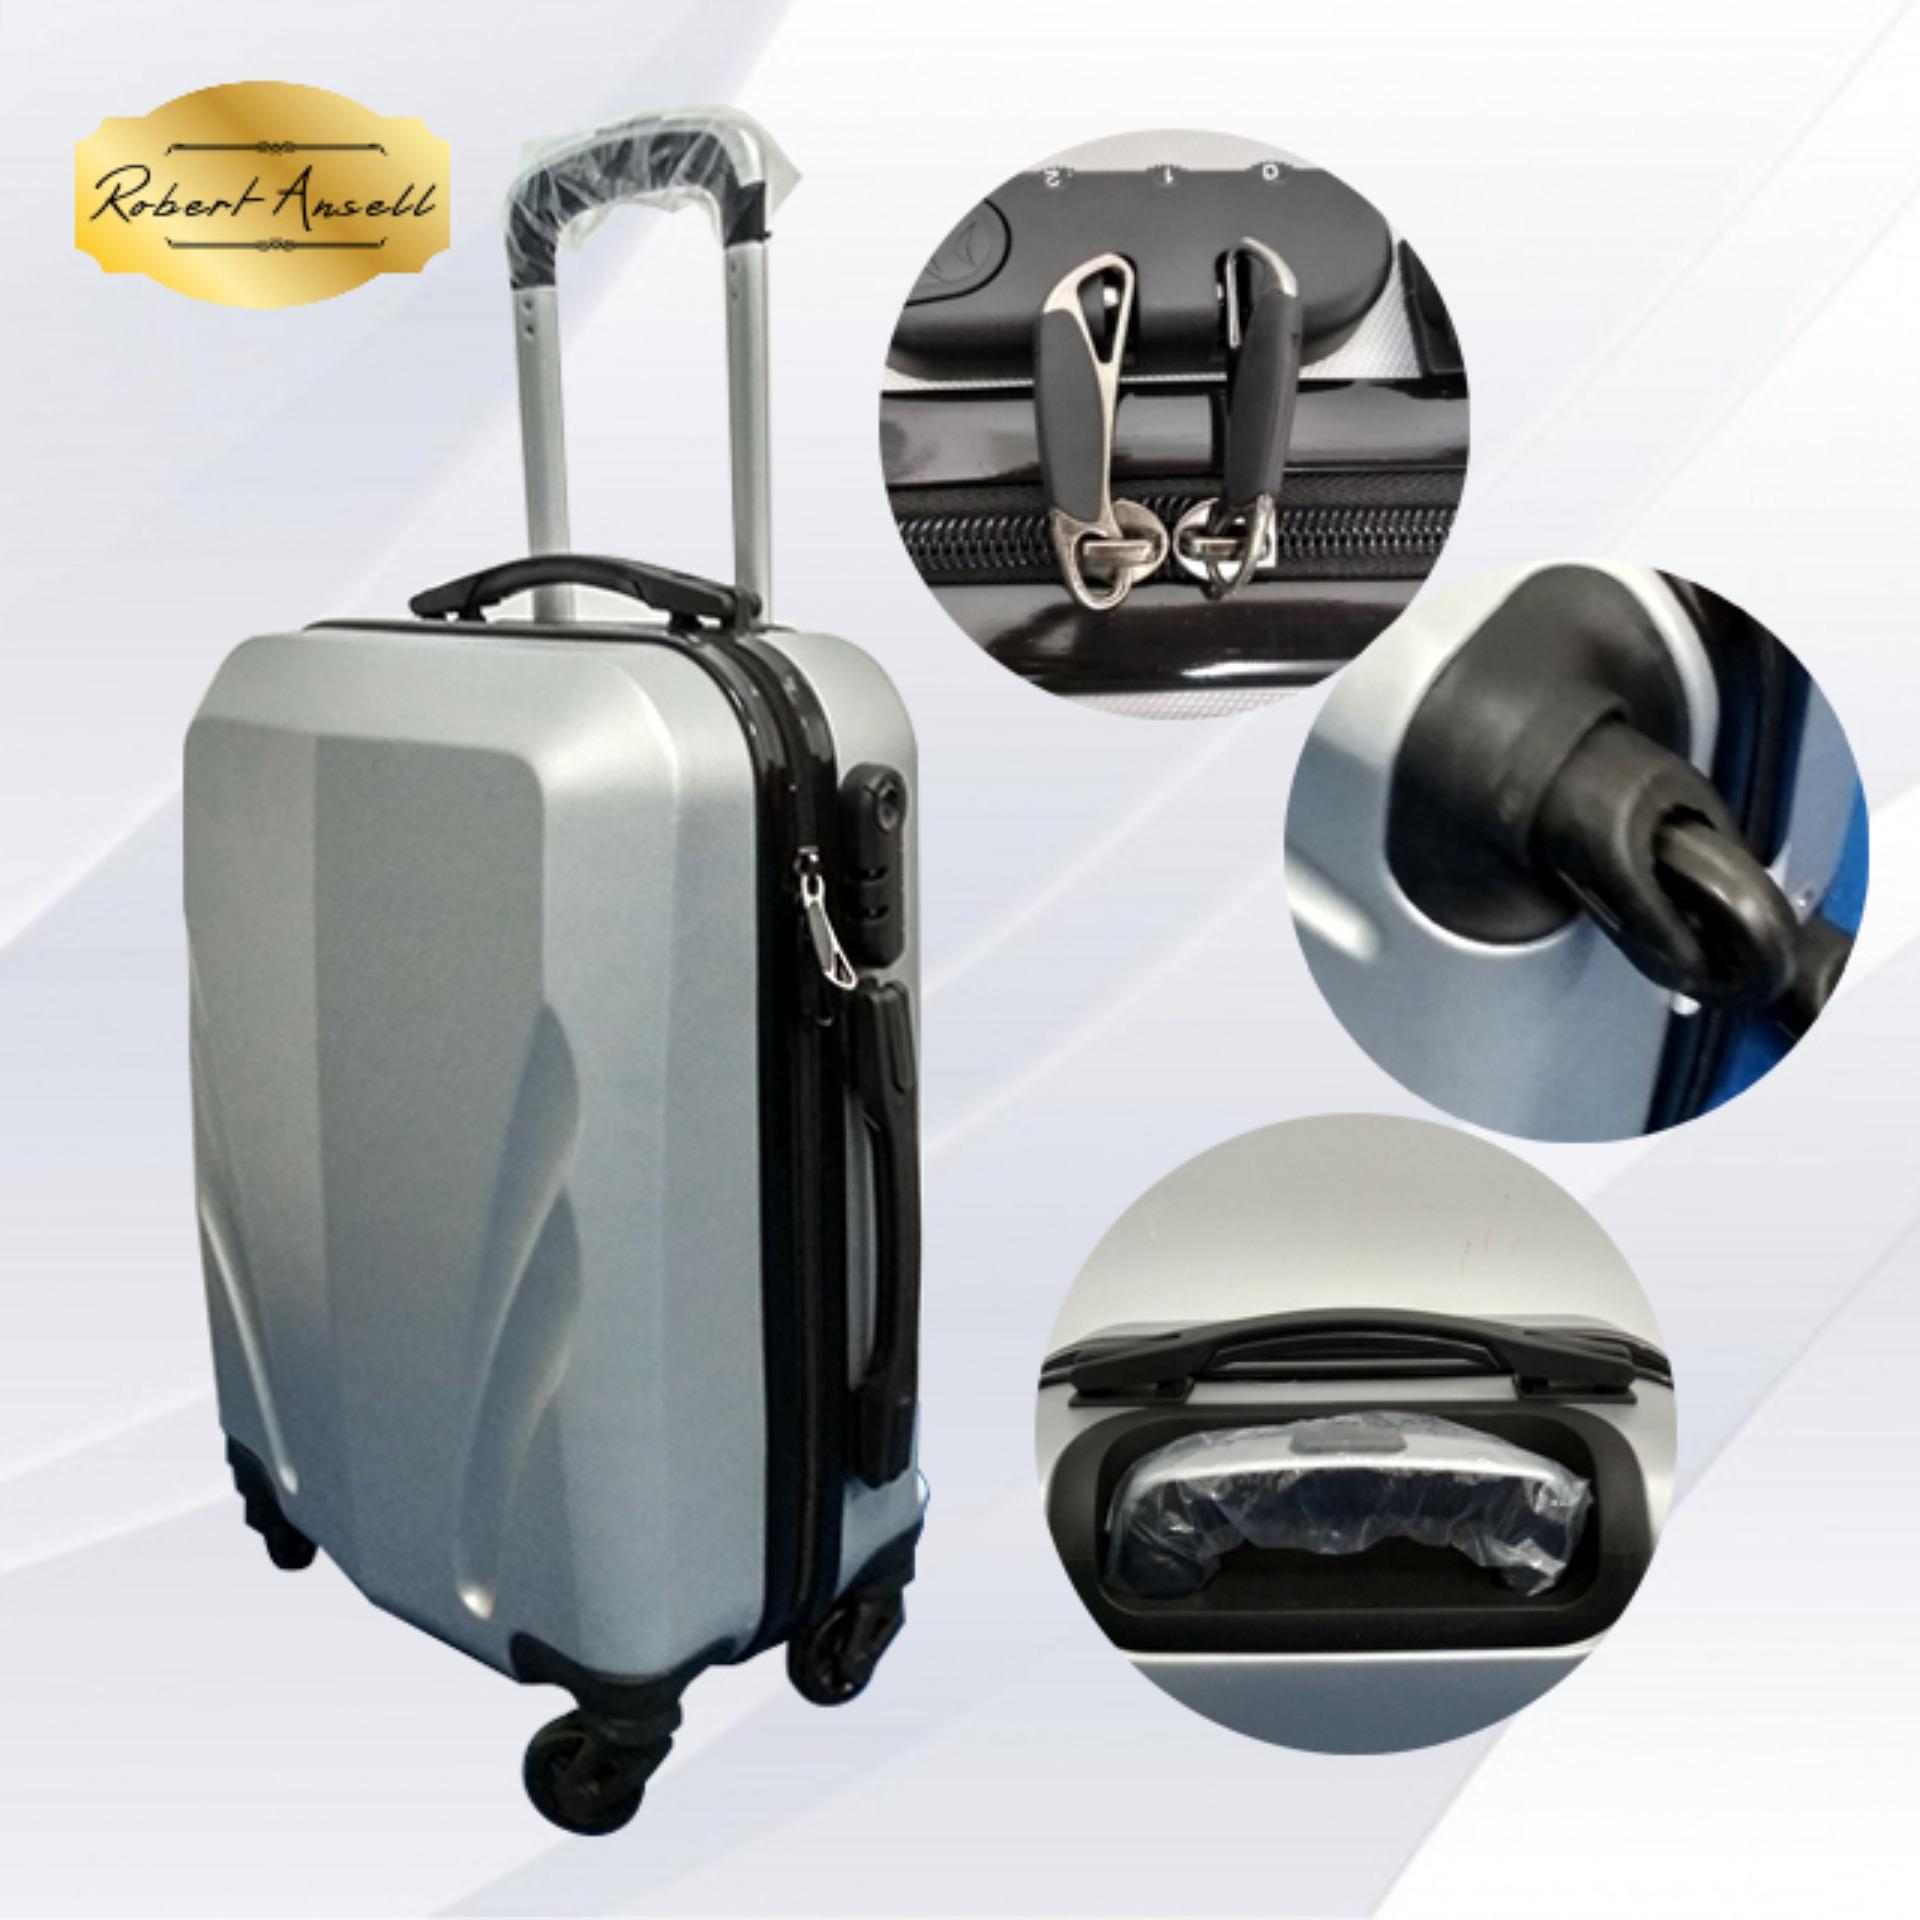 Polo Twin Hd 1608 Koper 20 24 Black Update Daftar Harga Terbaru Luggo Inch Stealth Silver Tas Hardcase Set